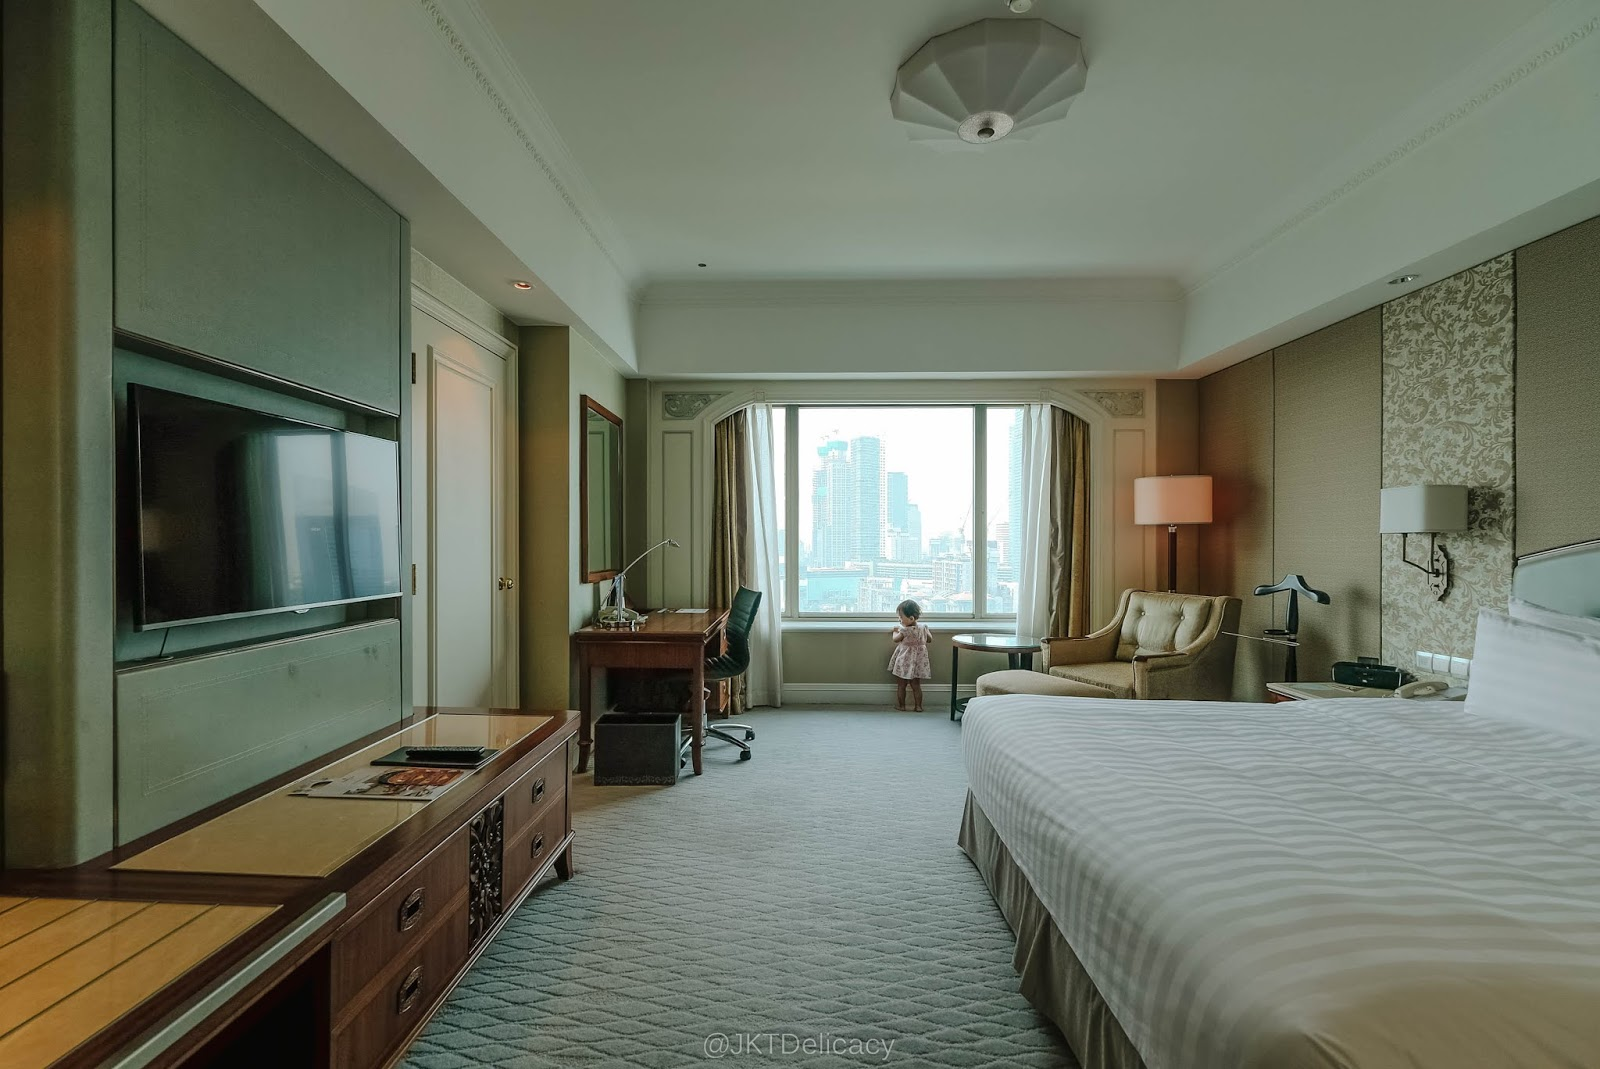 Jktdelicacy Com Shangri La Jakarta Staycation Hotel Review